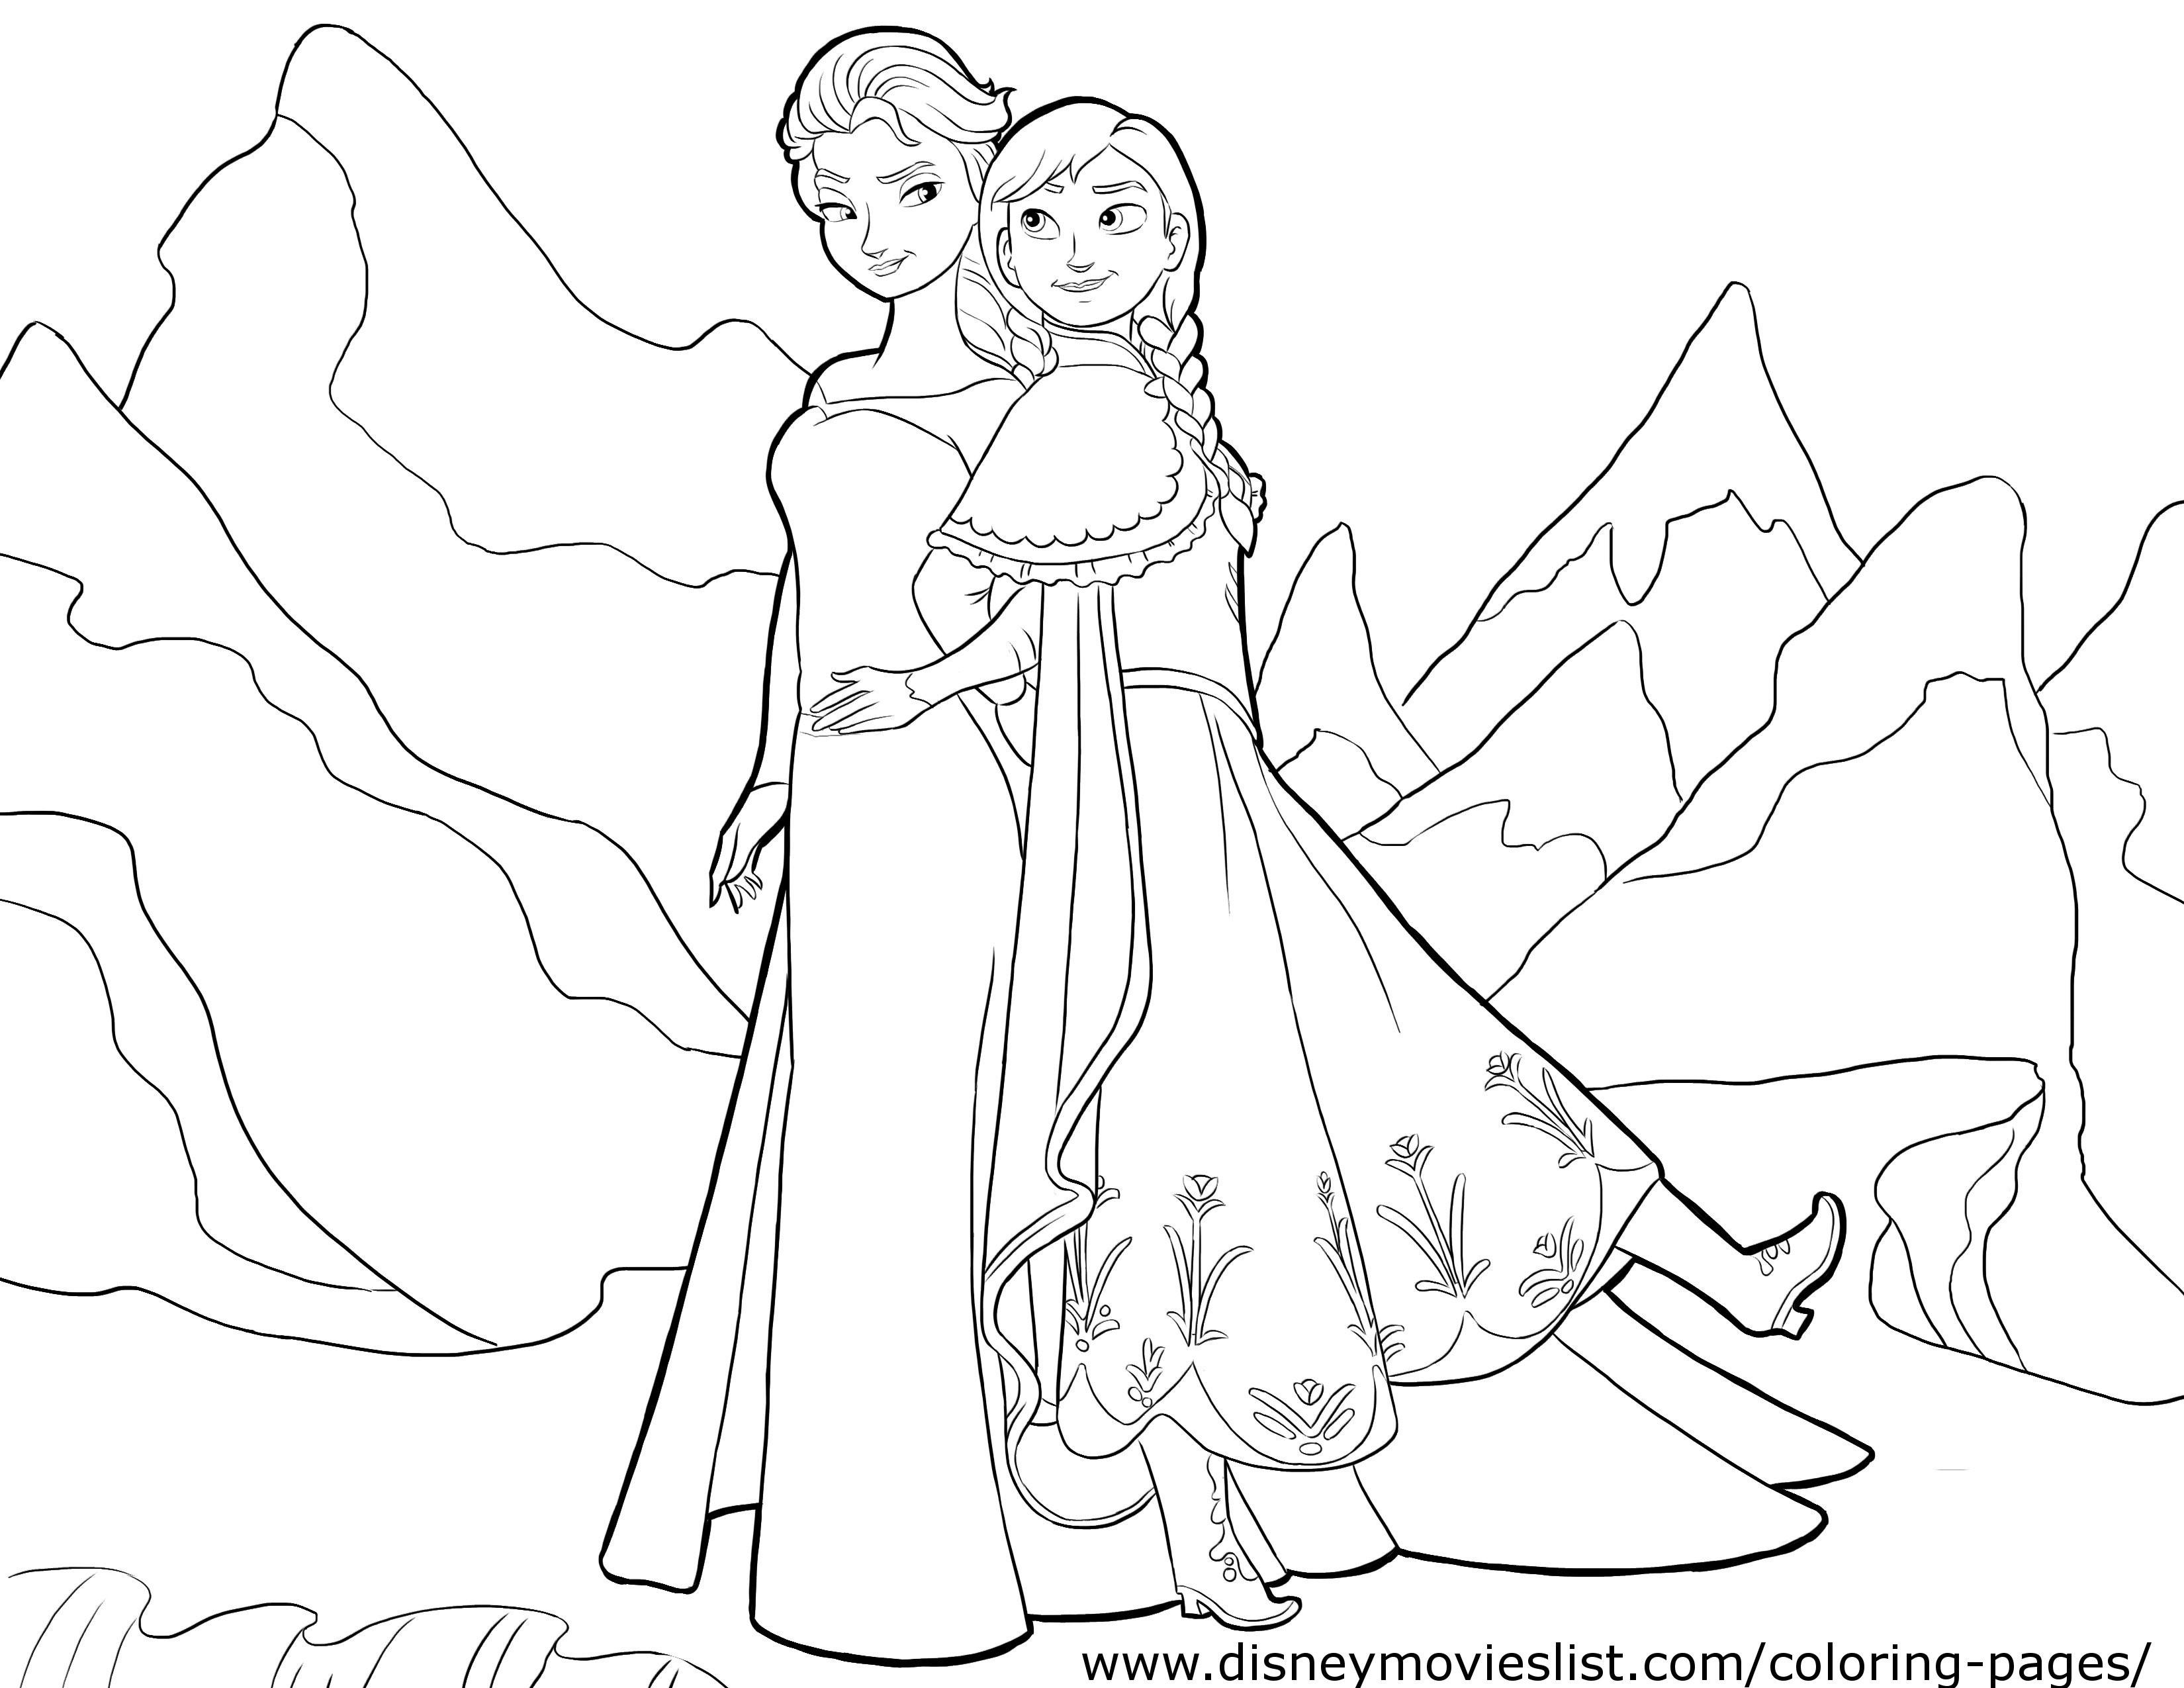 Coloring Pages Elsa  elsa coloring pages Free